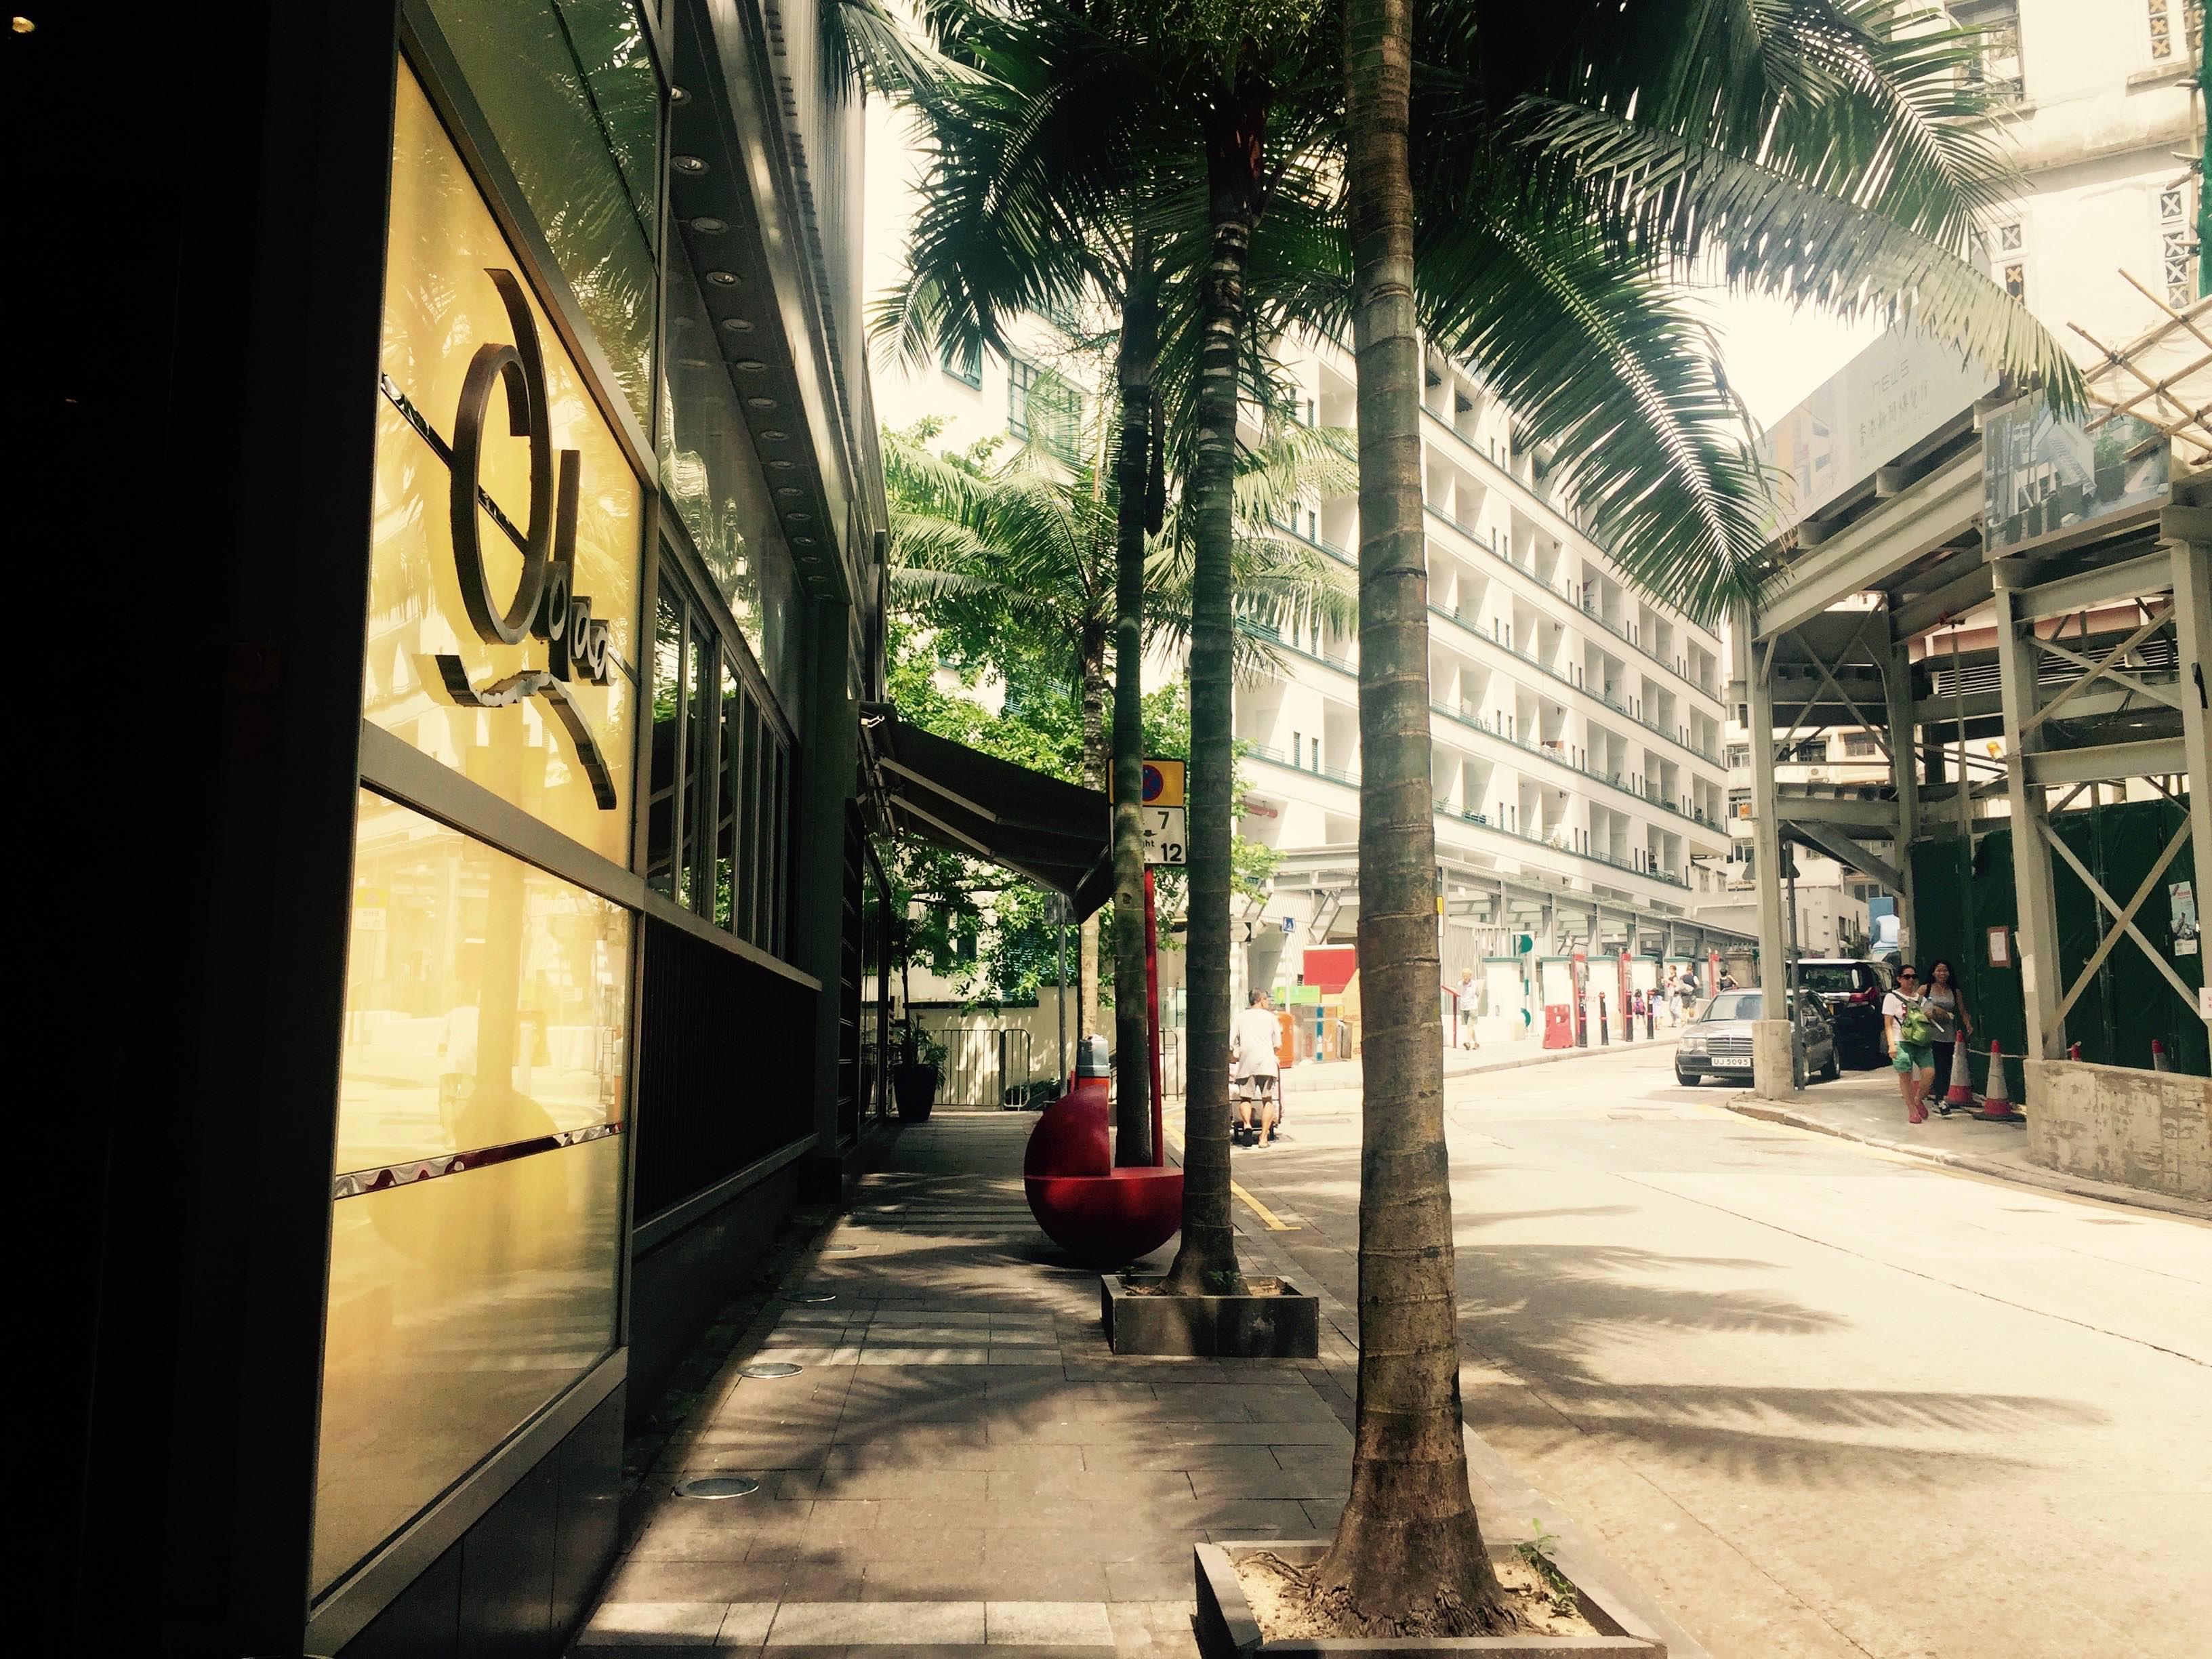 HK Sheung Wan Bridges Street relaxing dining environment close to Soho Central